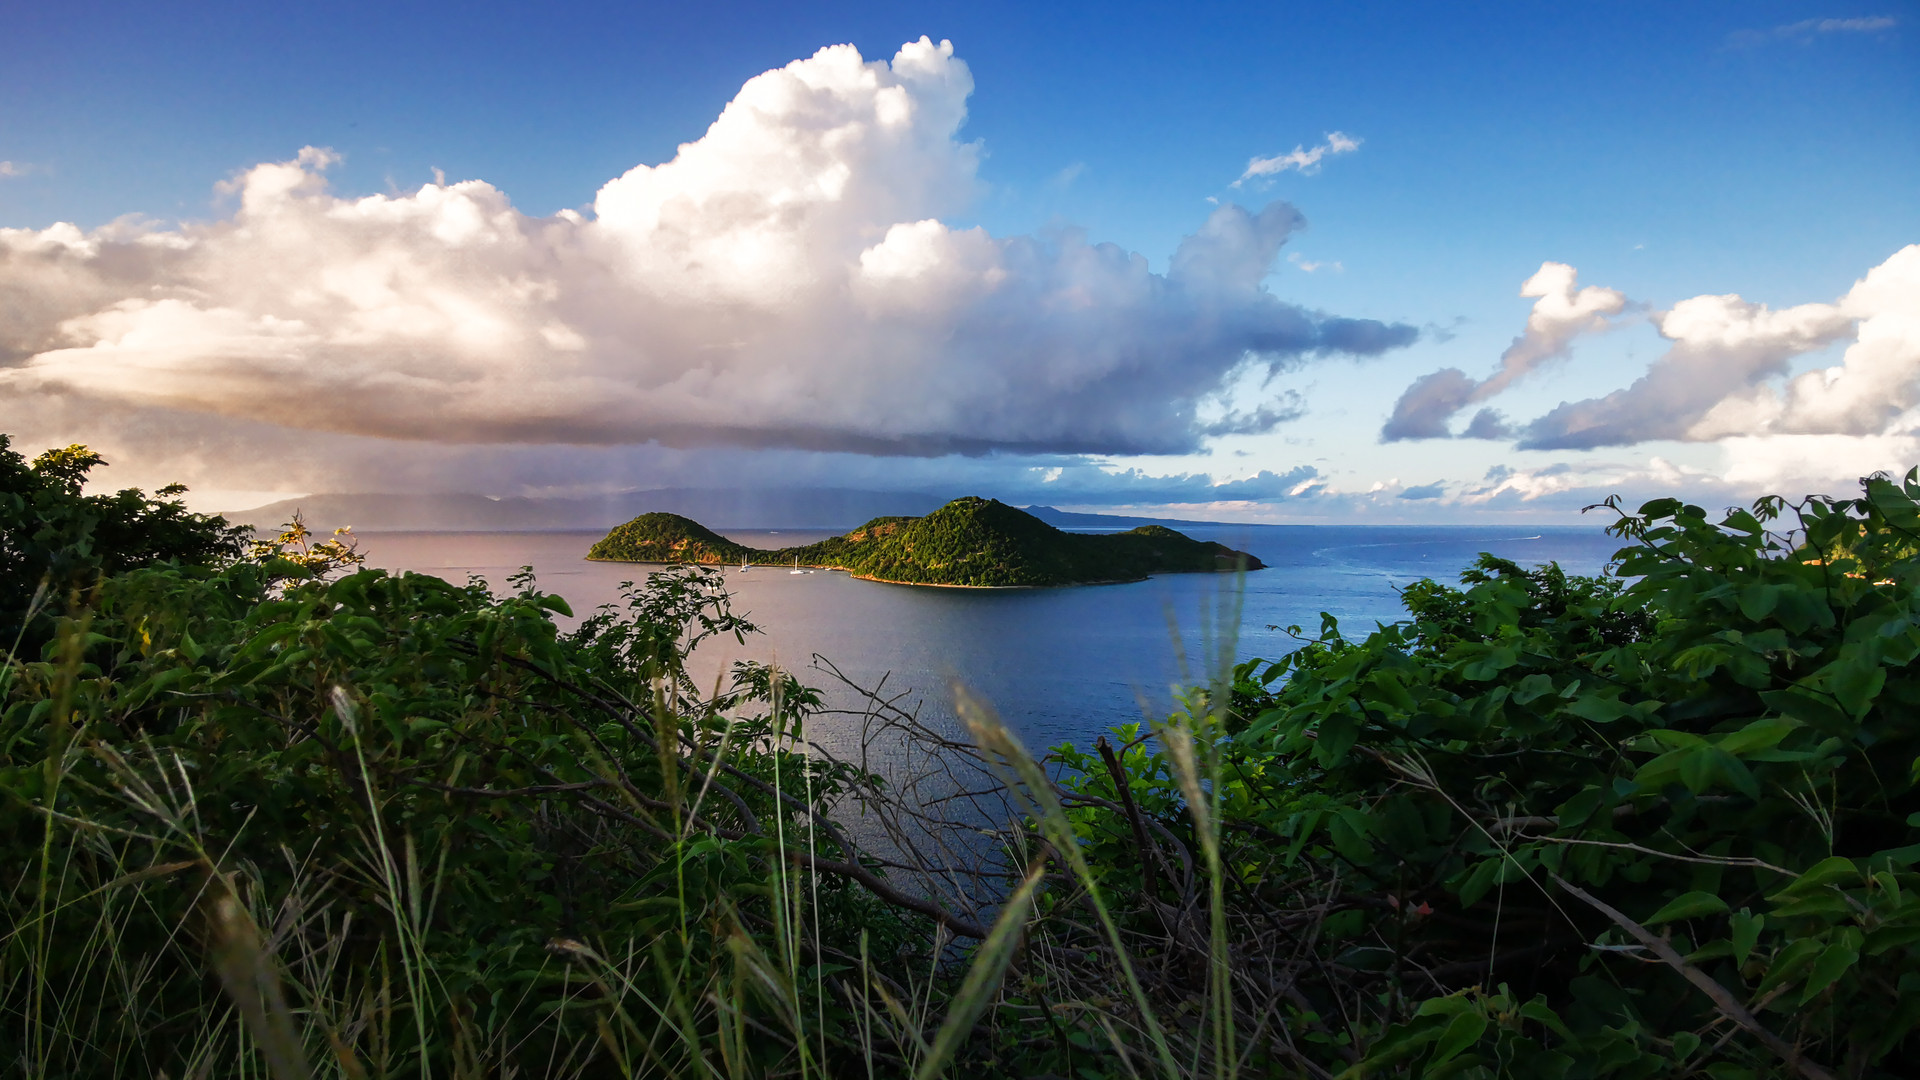 Josch Photo Guadeloupe : Paysage - Les Saintes - Guadeloupe